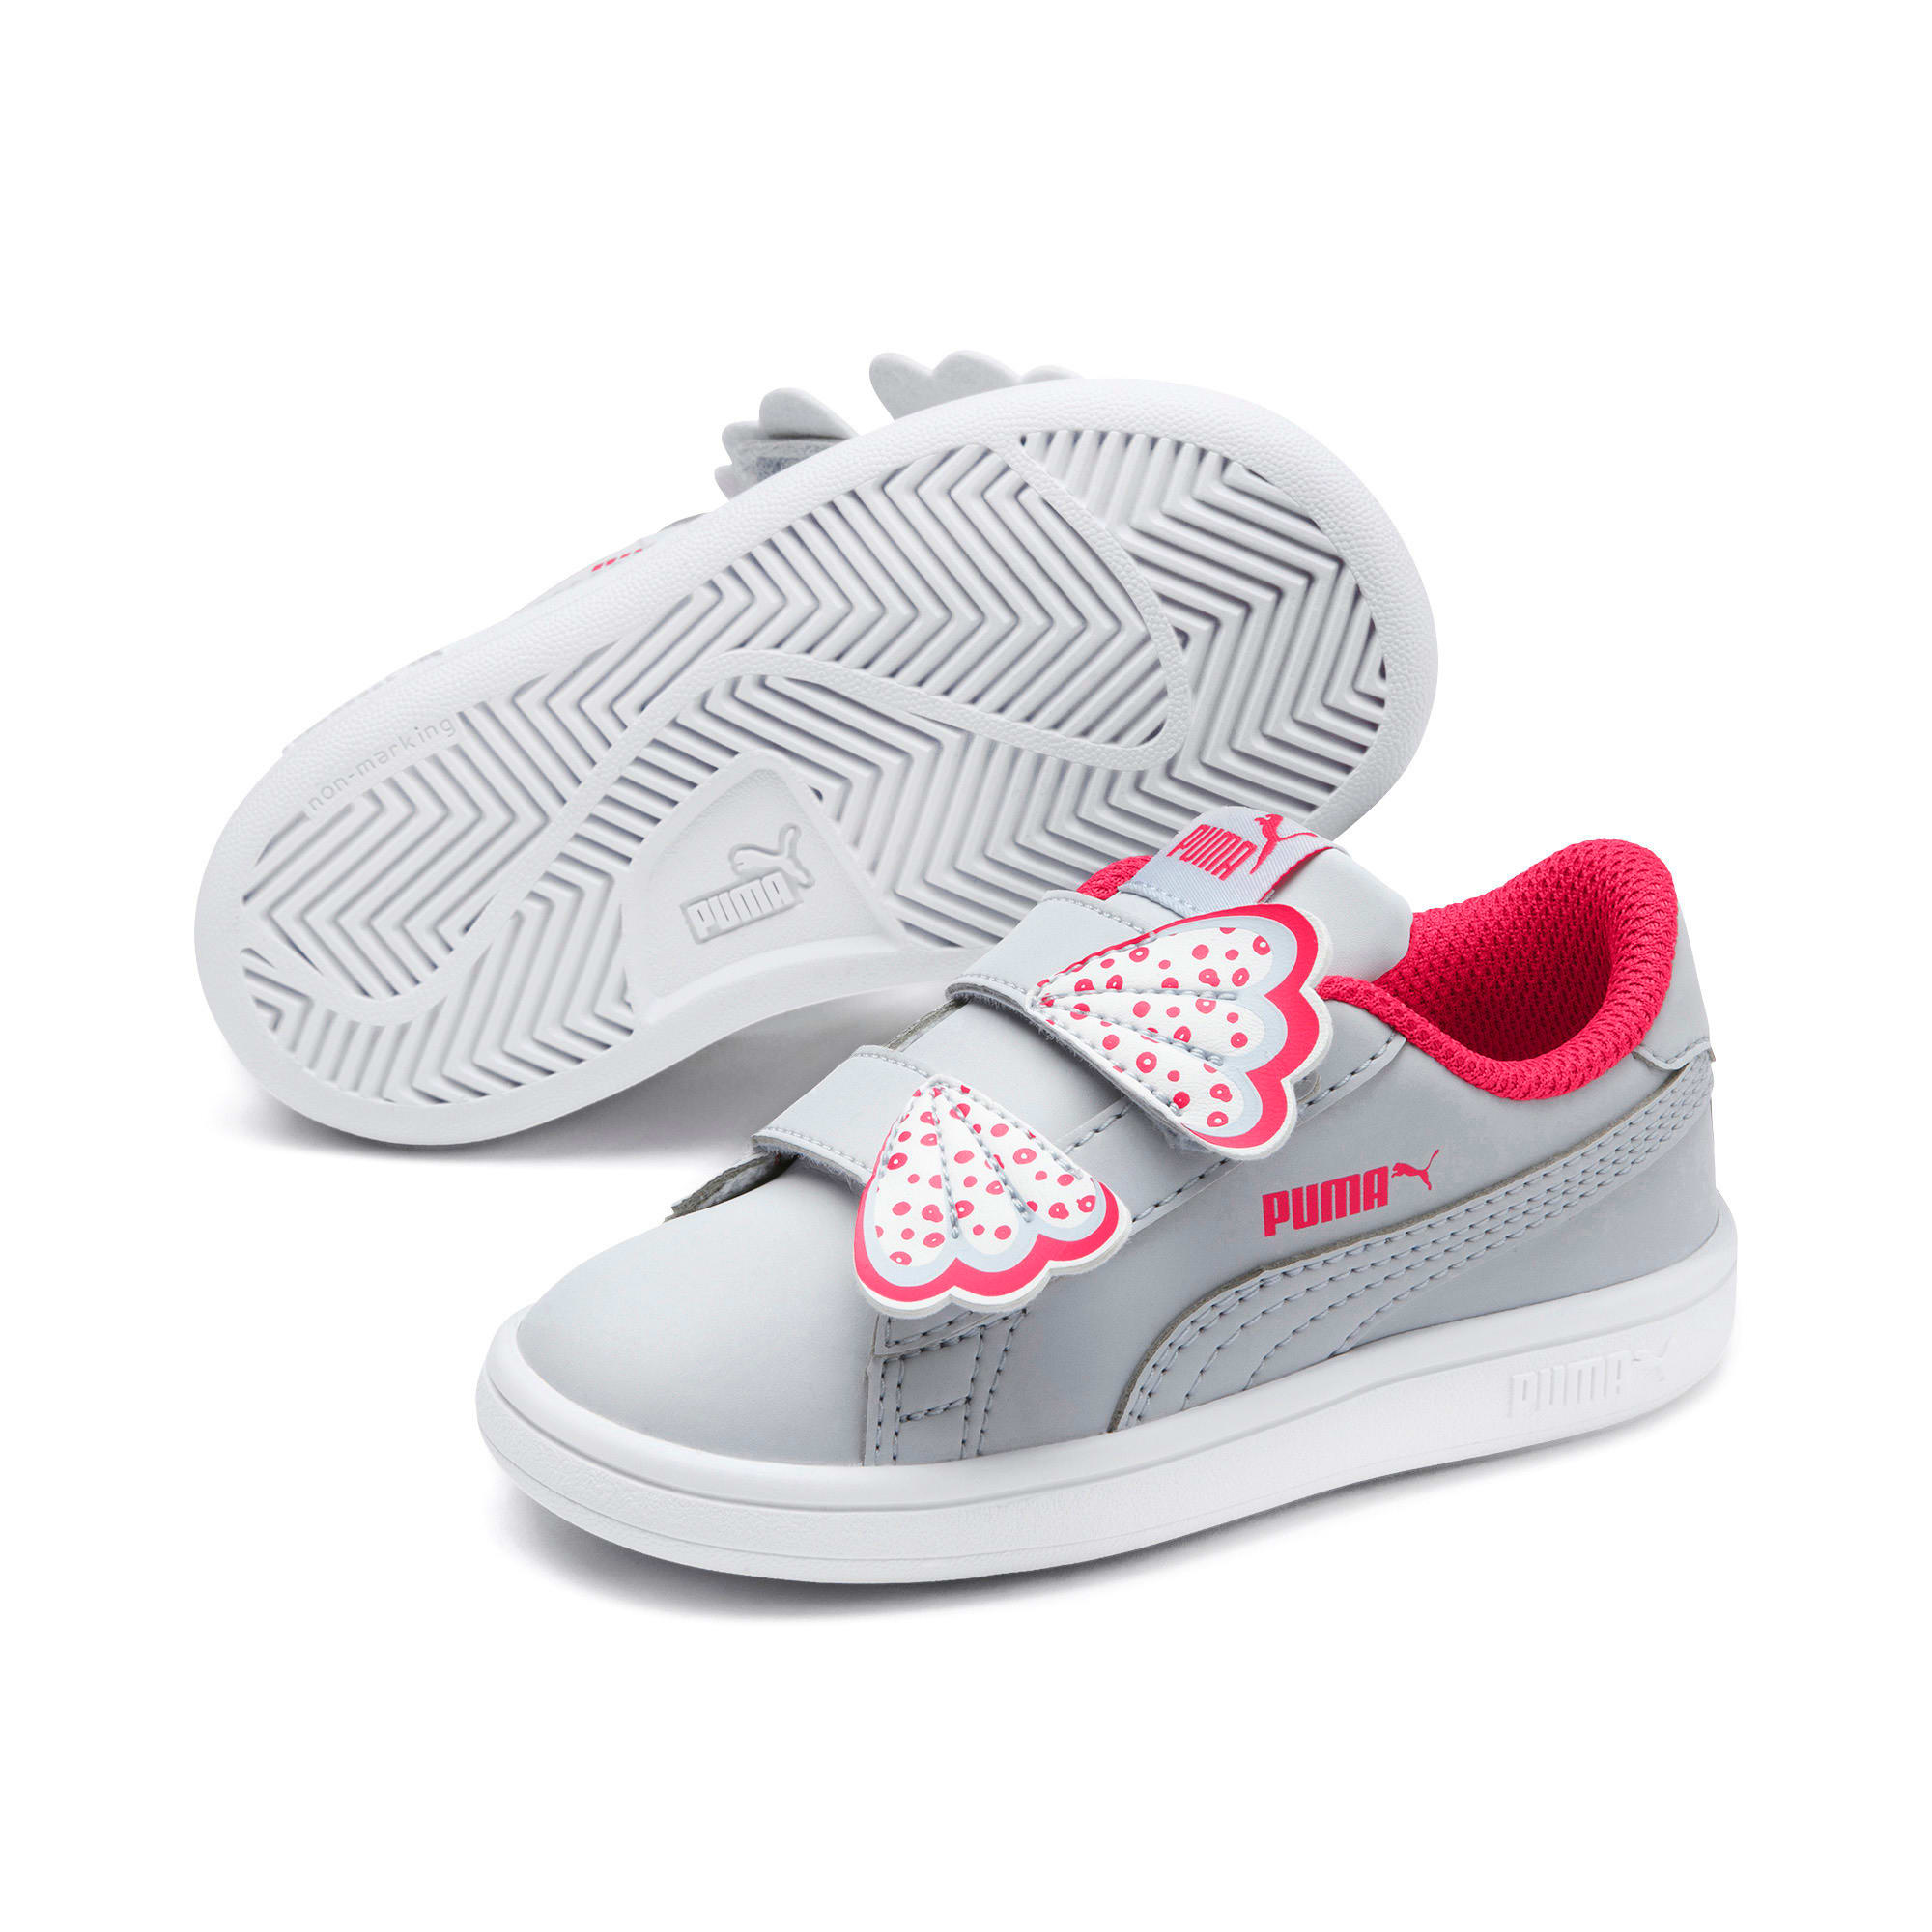 Thumbnail 2 of PUMA Smash v2 Butterfly AC Toddler Shoes, Heather-Nrgy Rose-Puma White, medium